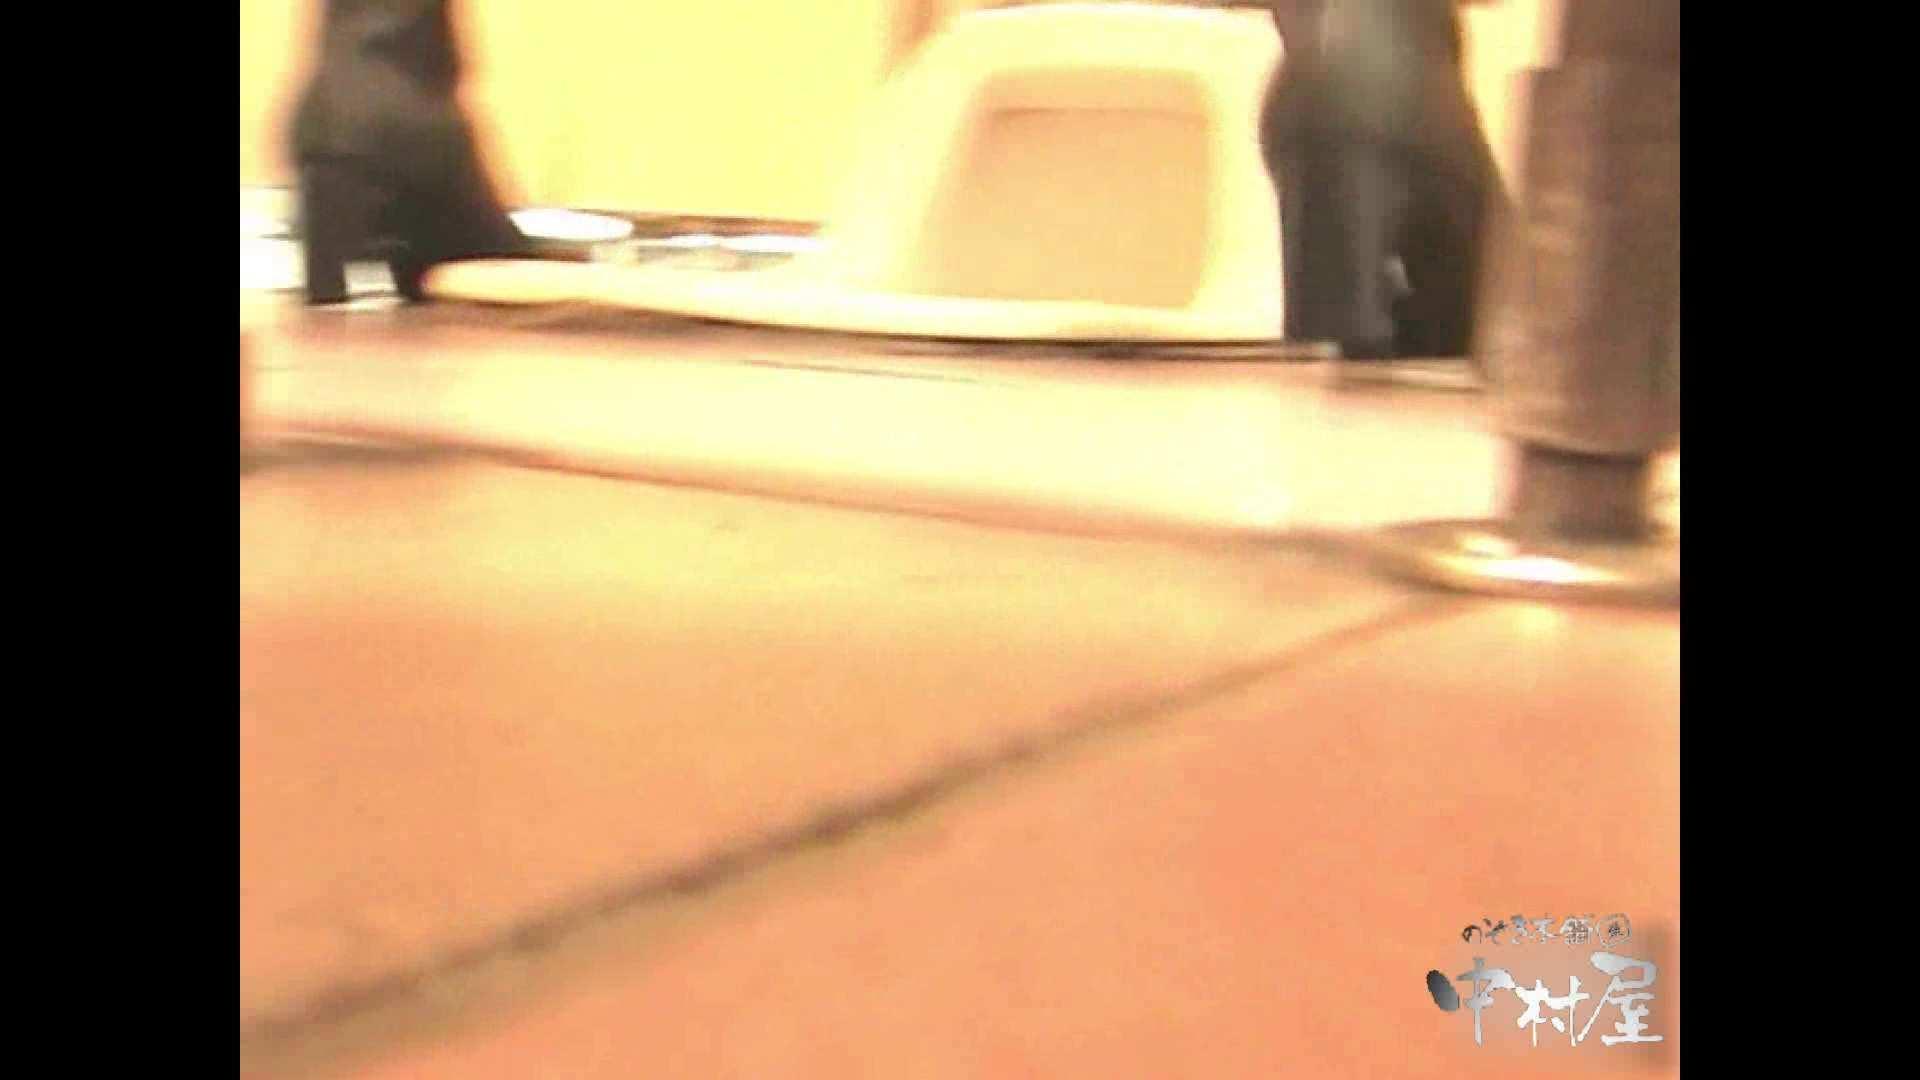 岩手県在住盗撮師盗撮記録vol.02 ギャルの放尿 オメコ無修正動画無料 79連発 23